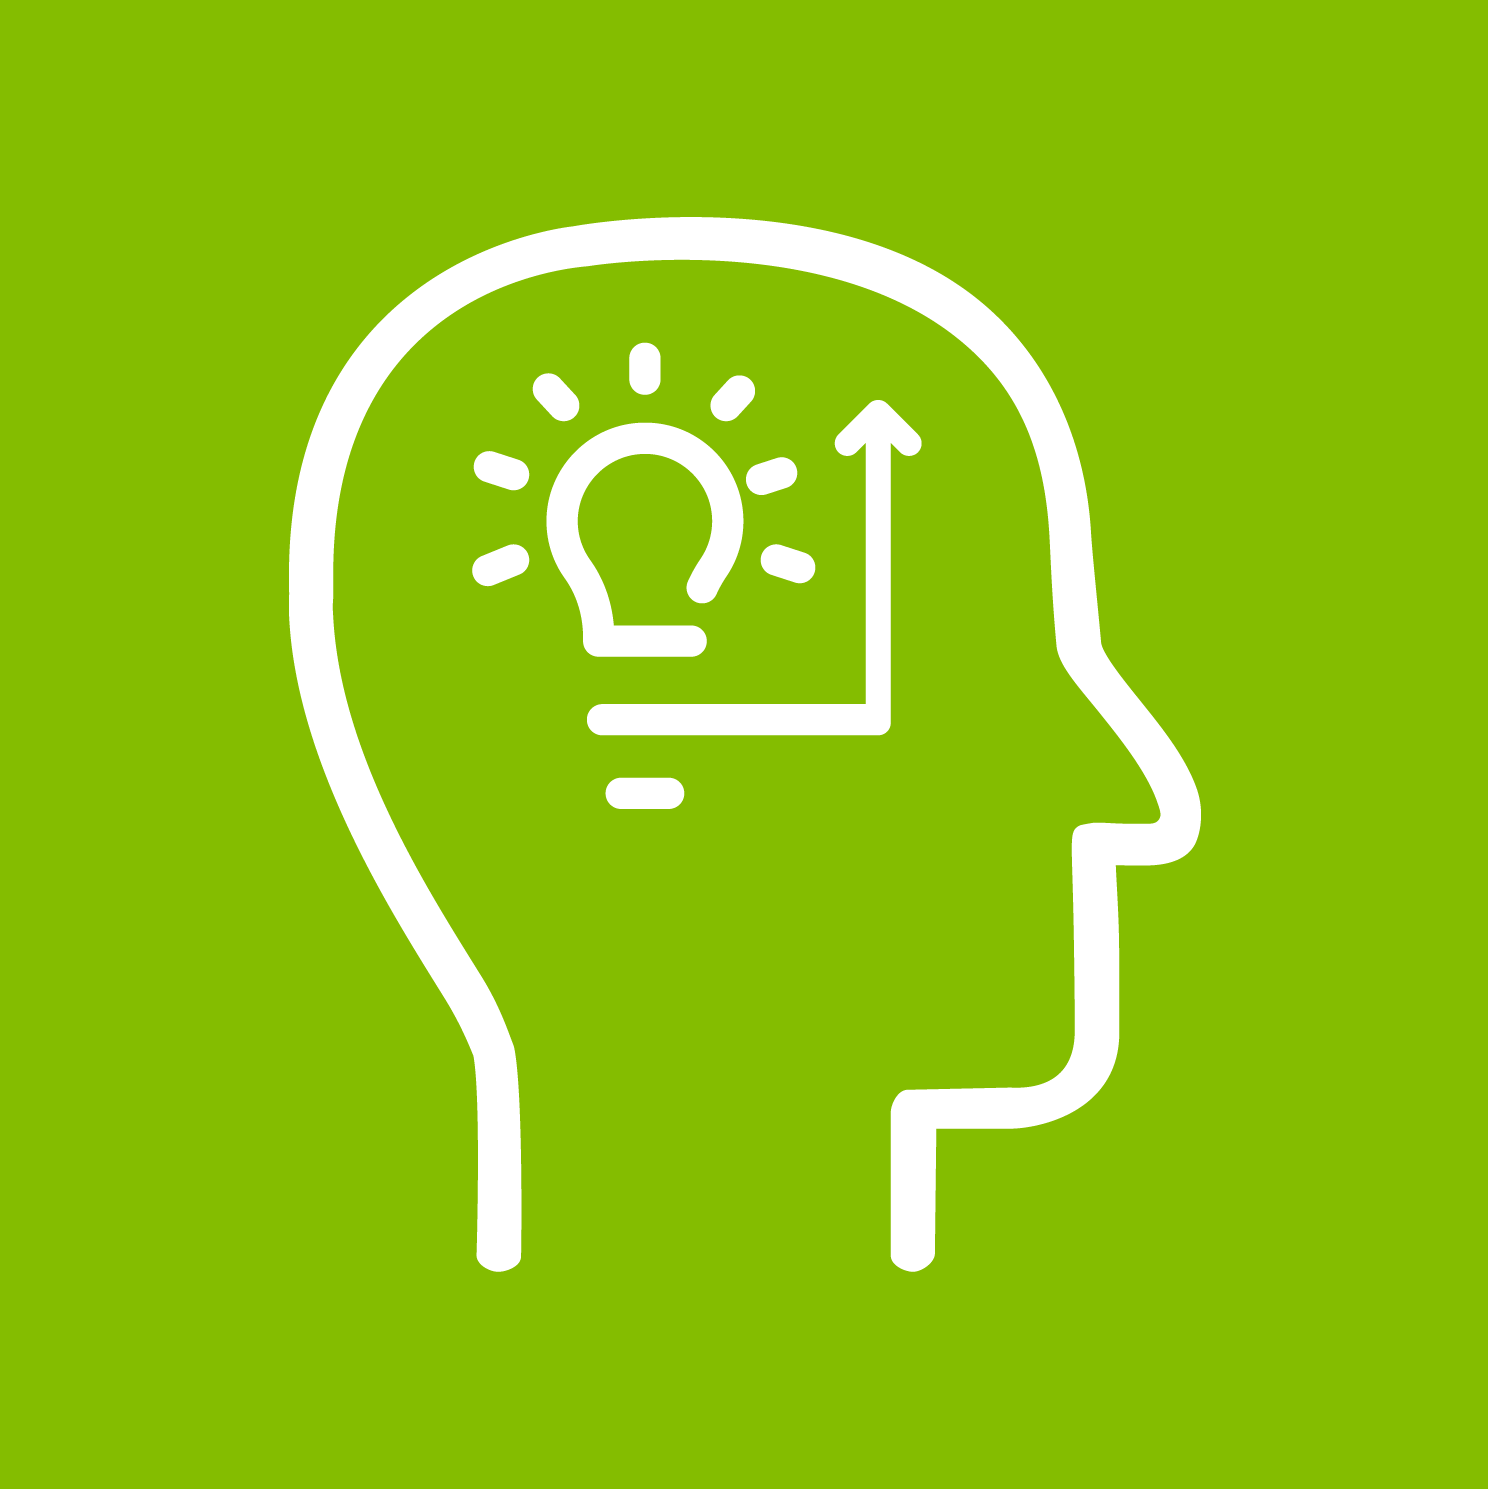 syspro_values_growth_mindset_F_icon